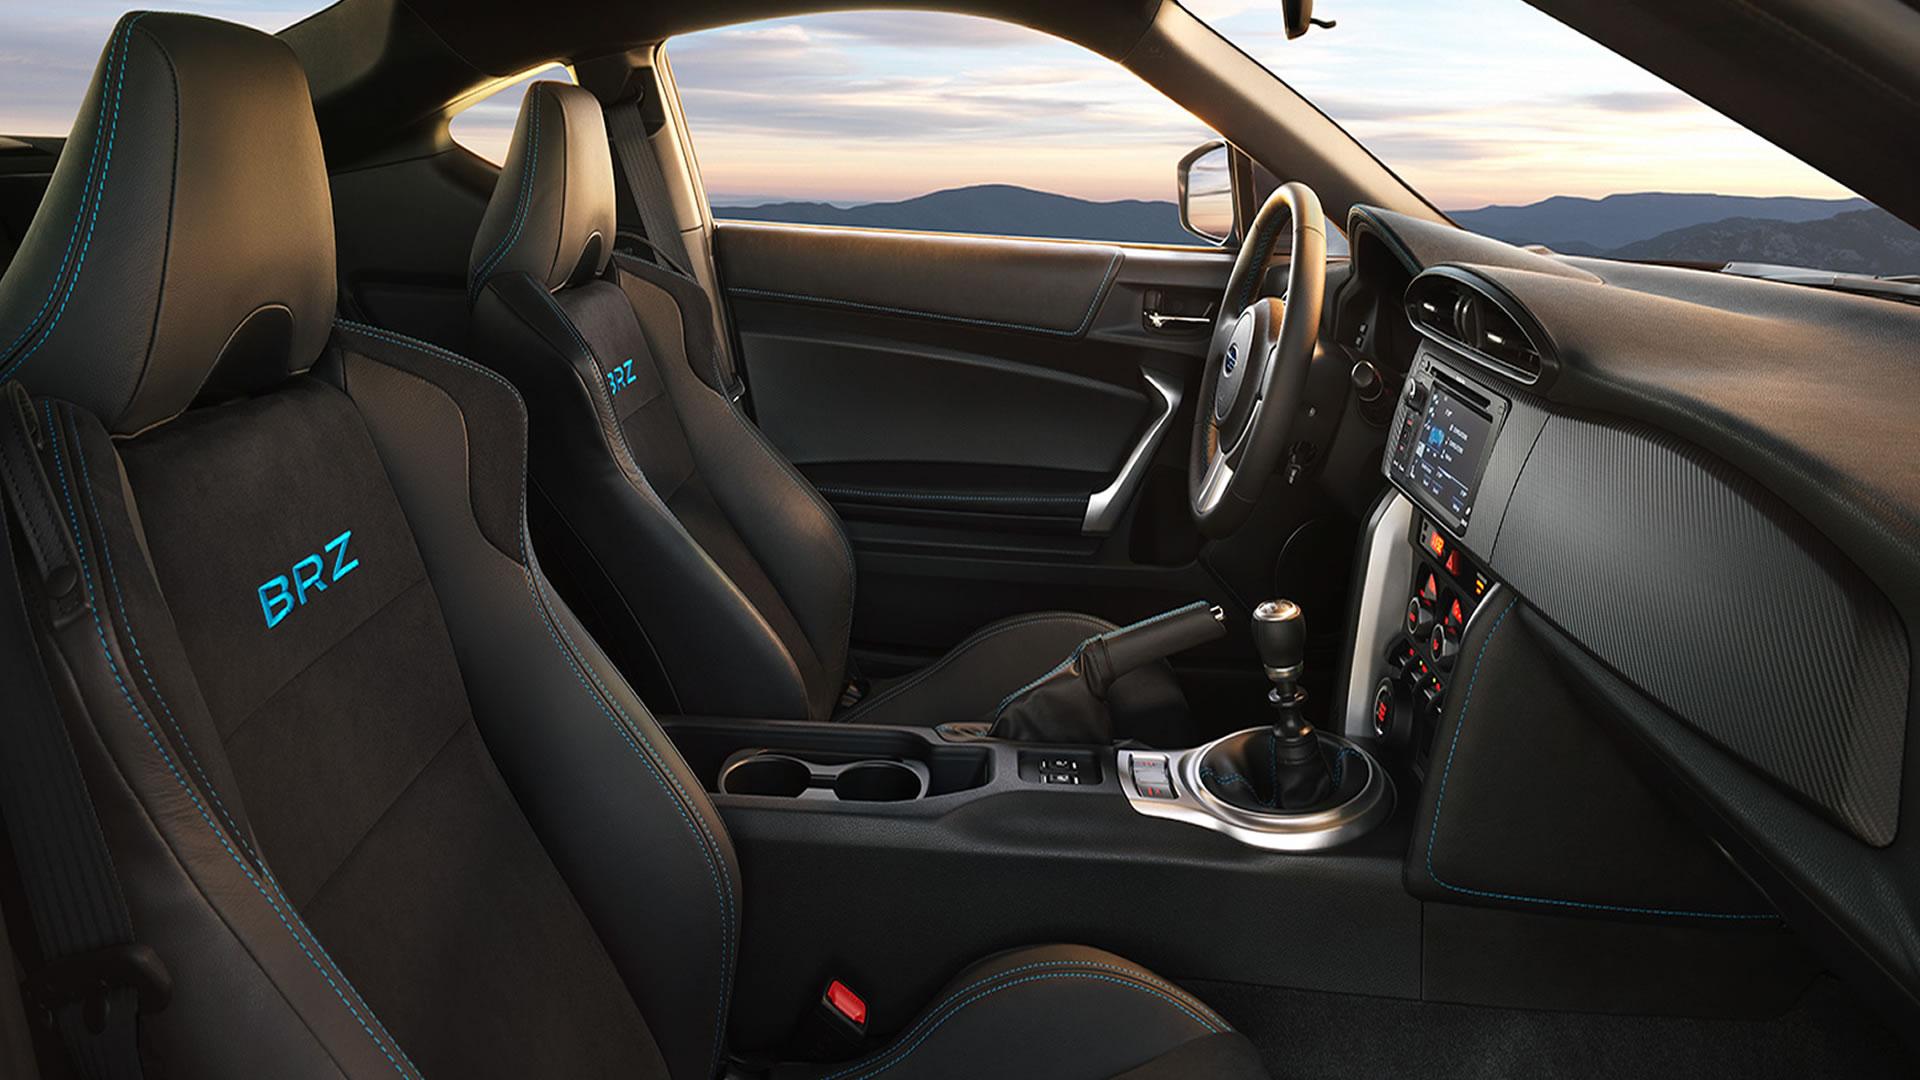 Hyper Blue Brz >> 2016 Subaru Wrx Sti Brz Hikari Edition Subaru Canada